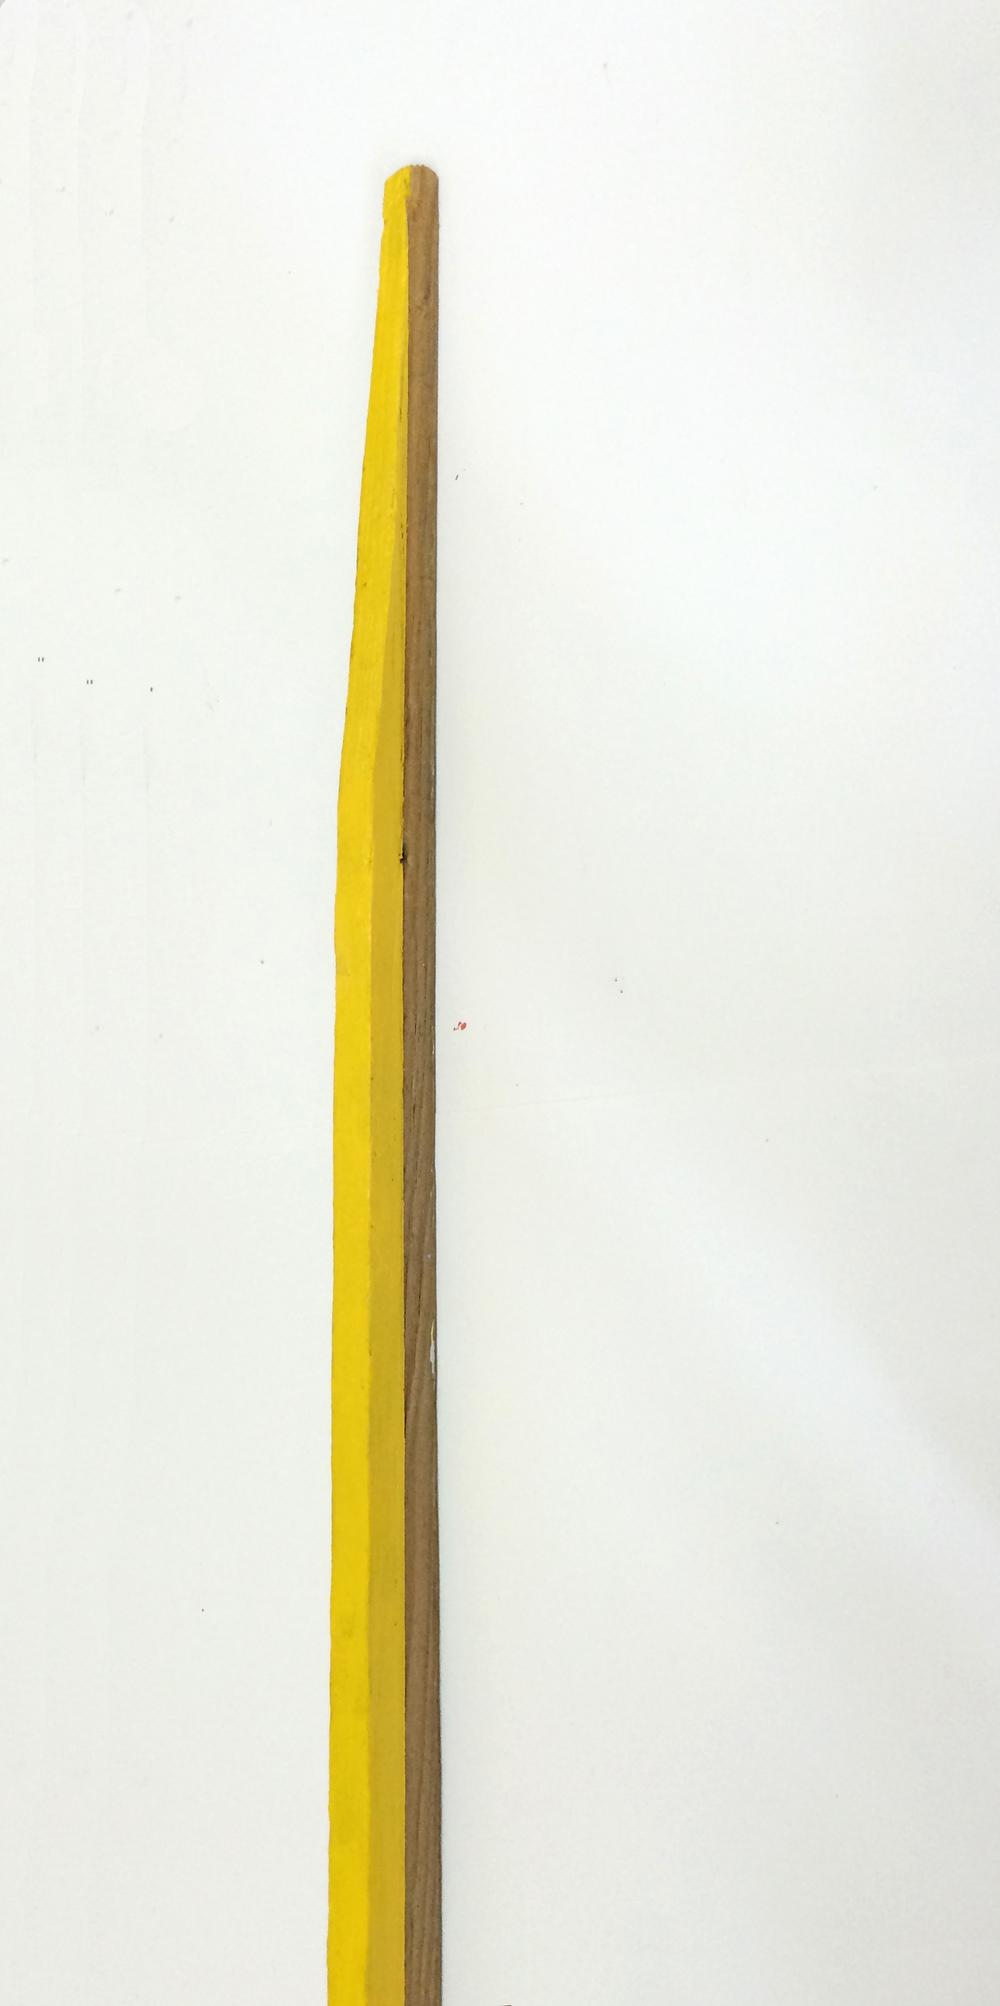 A- Linea amarilla, detalle, 120 x 3 x 5 cms, óleo sobre madera